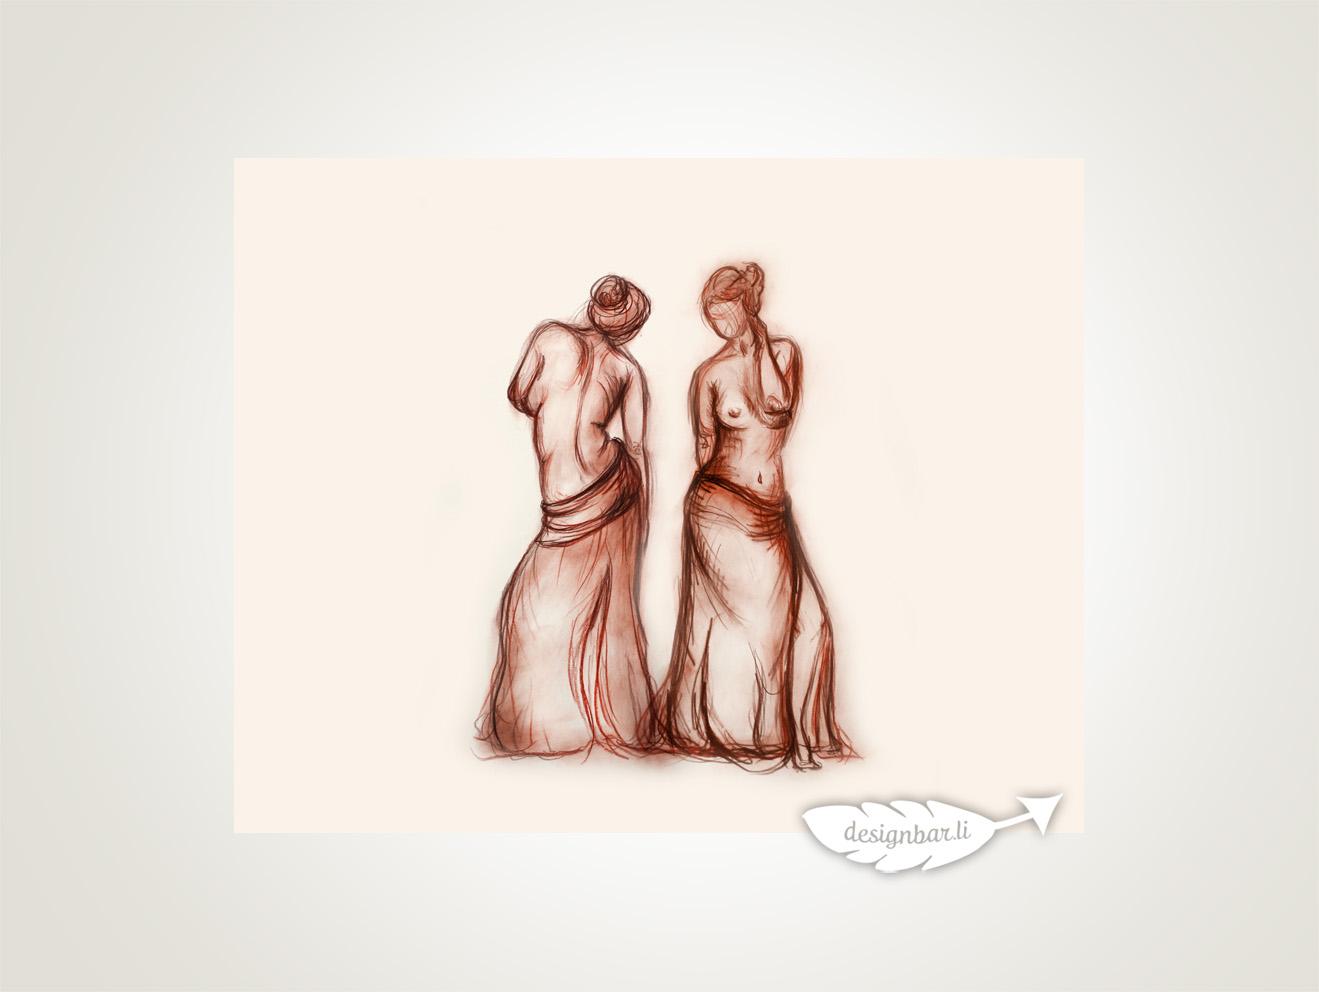 dancingshape_designbar